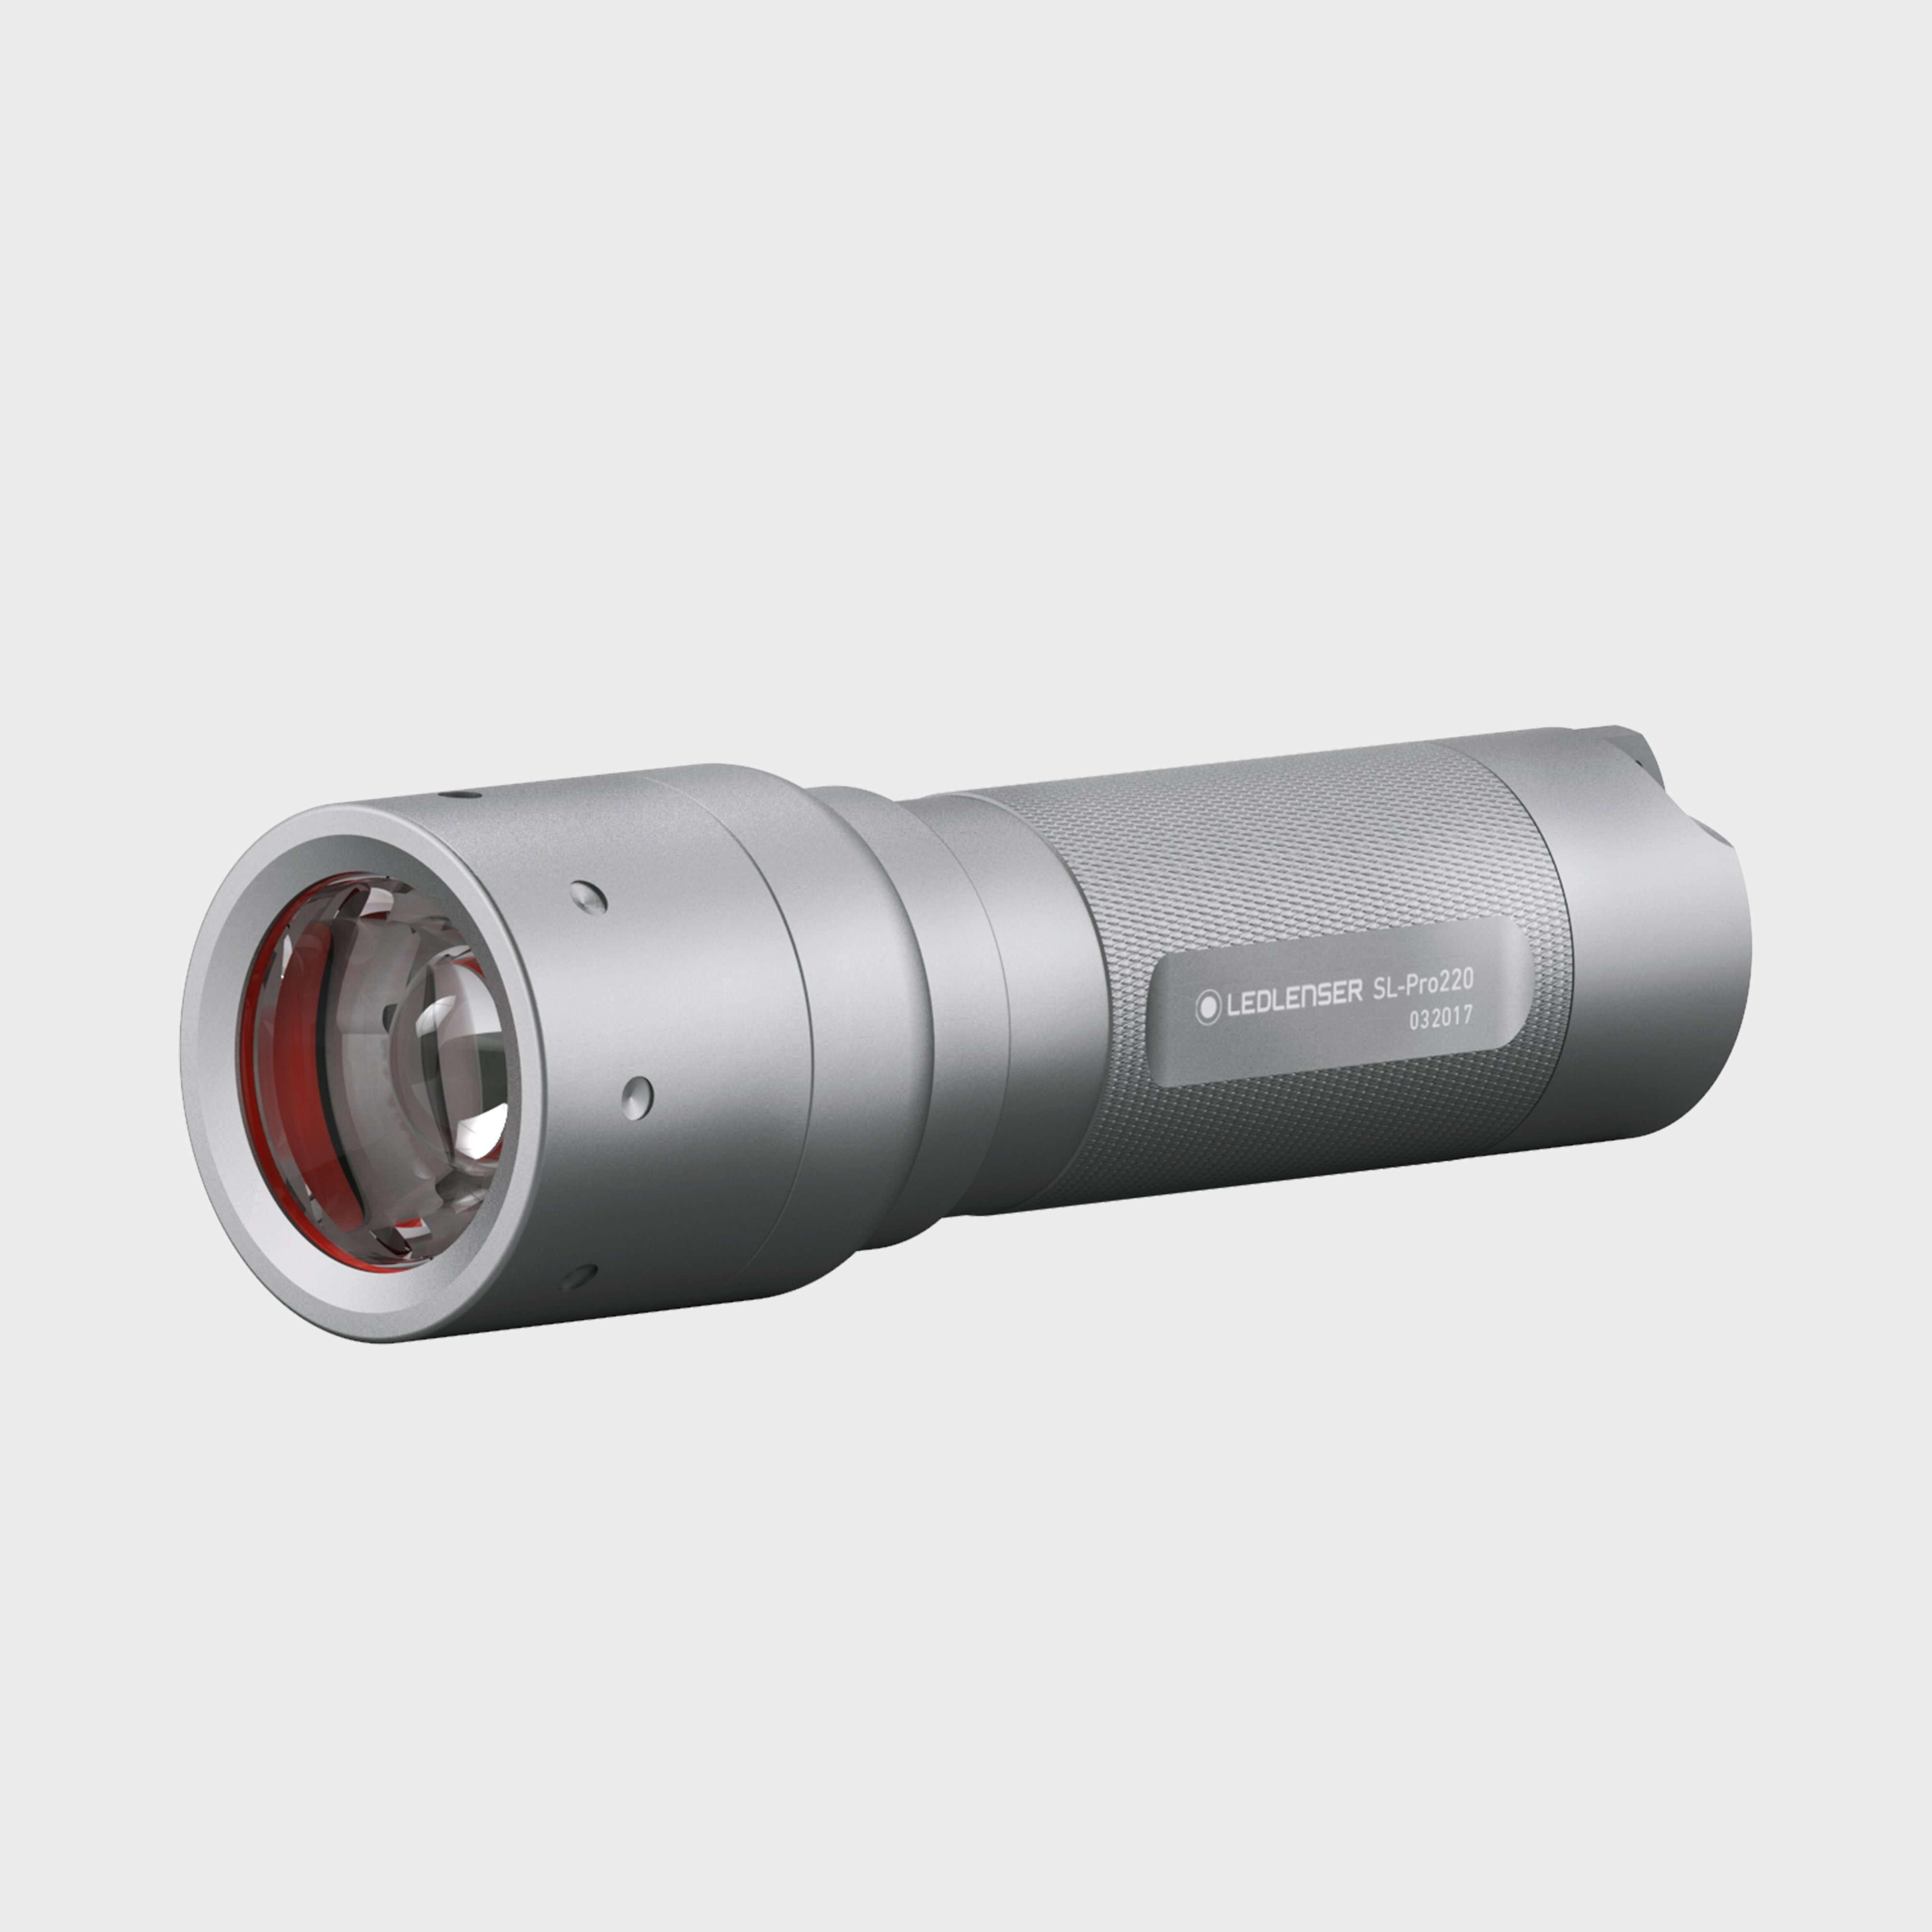 LED LENSER SL-Pro 220 Torch